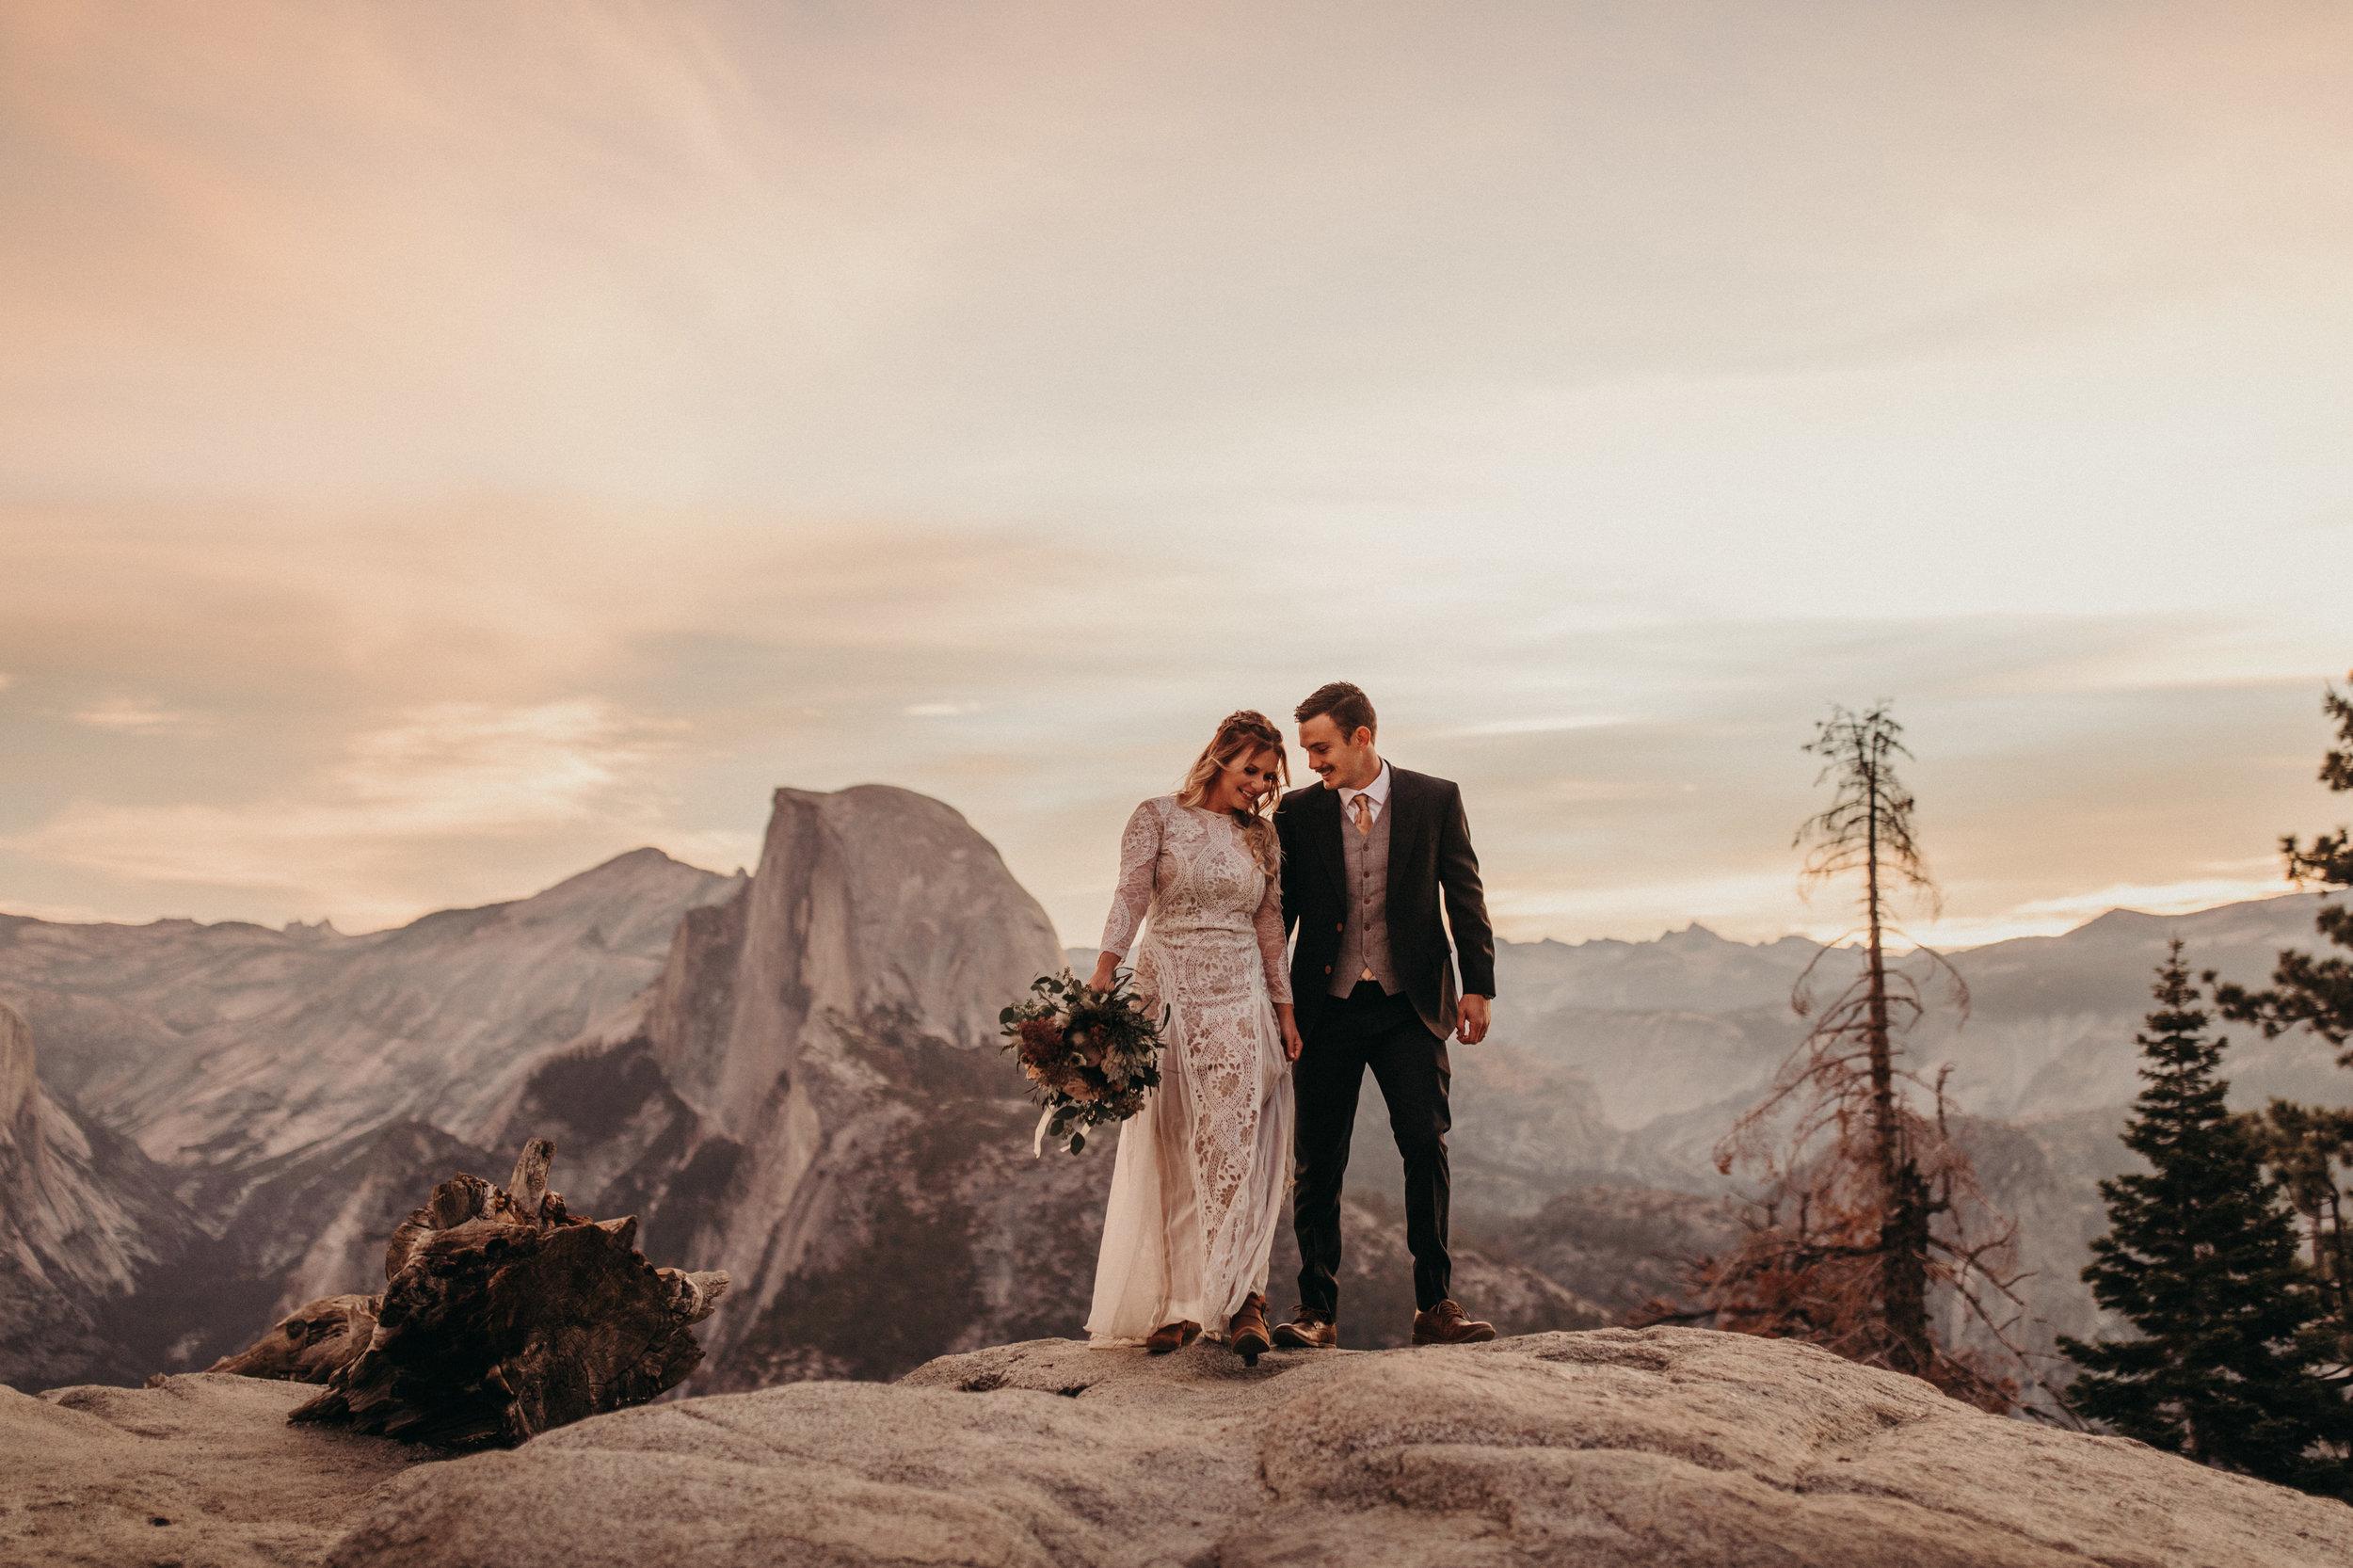 LINDSAY + NOLON - Sunrise elopement in Yosemite